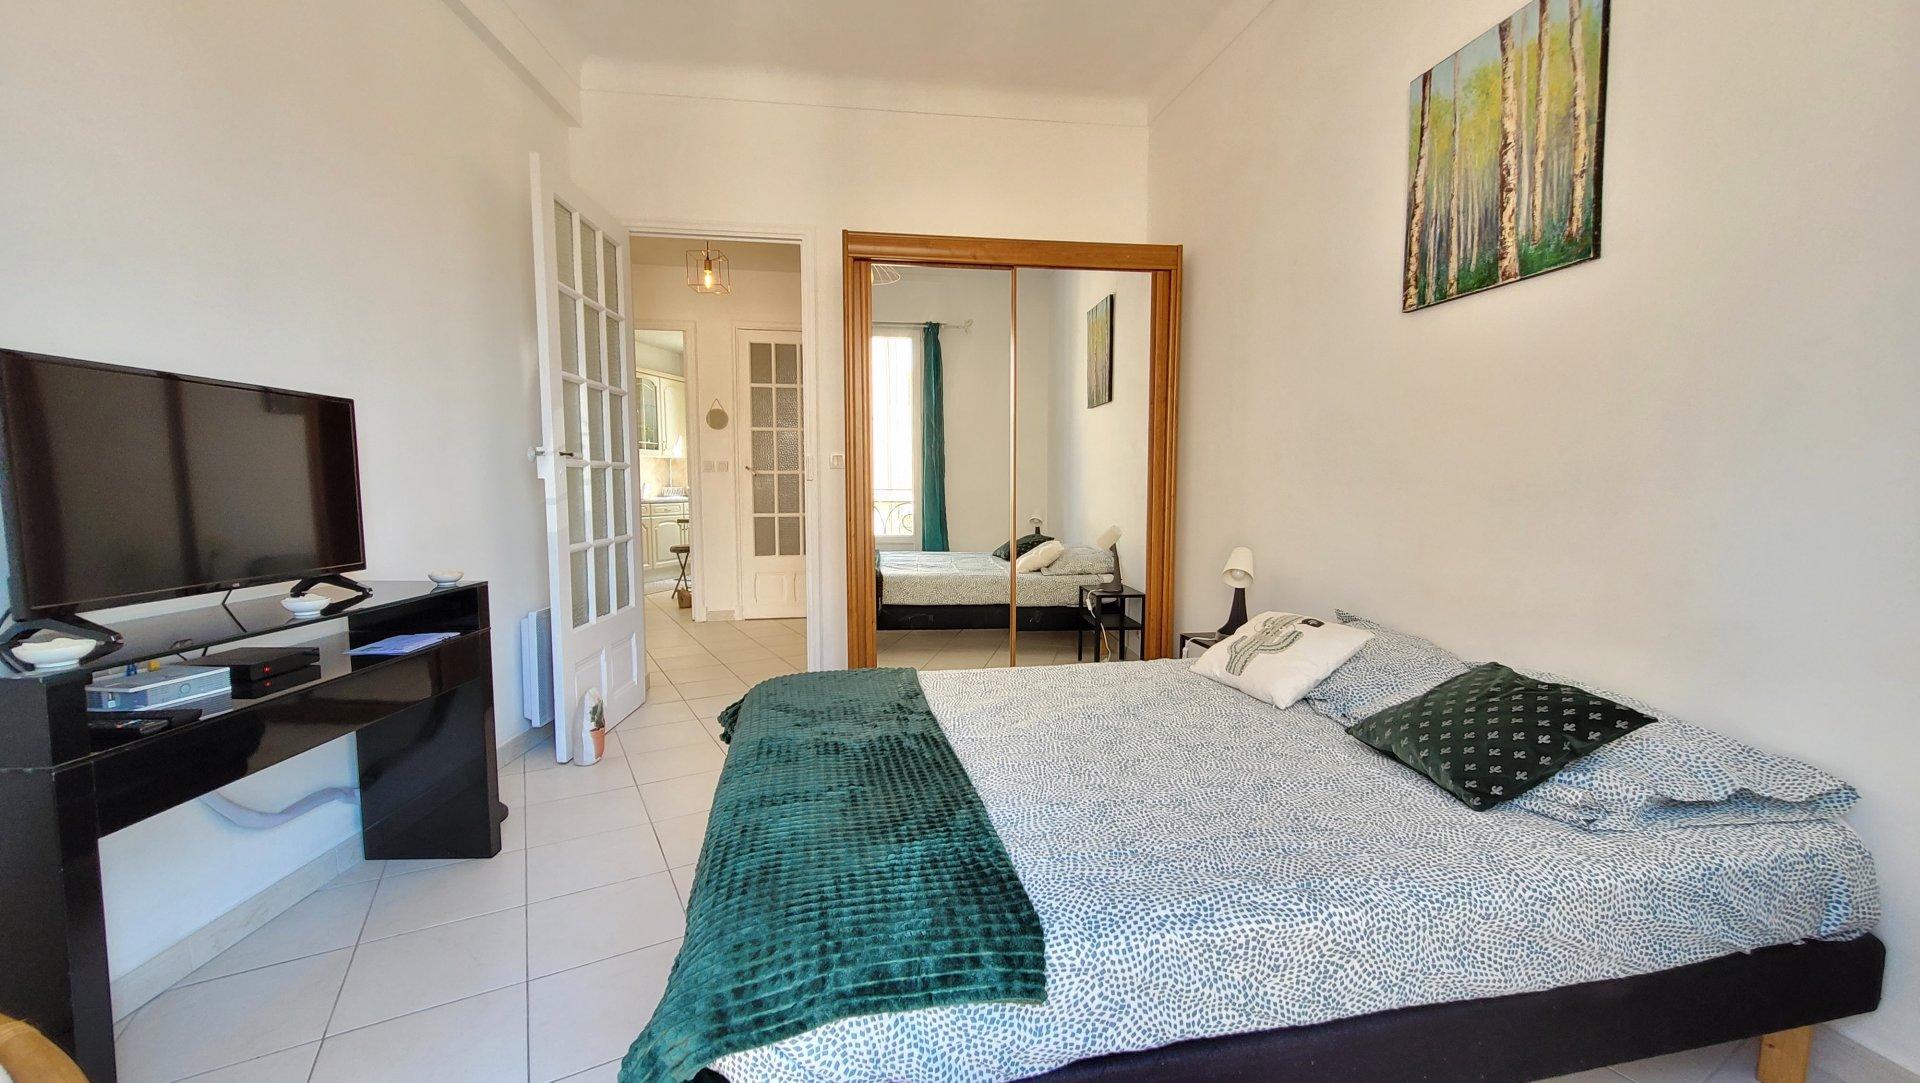 Affitto Appartamento - Cannes Petit Juas